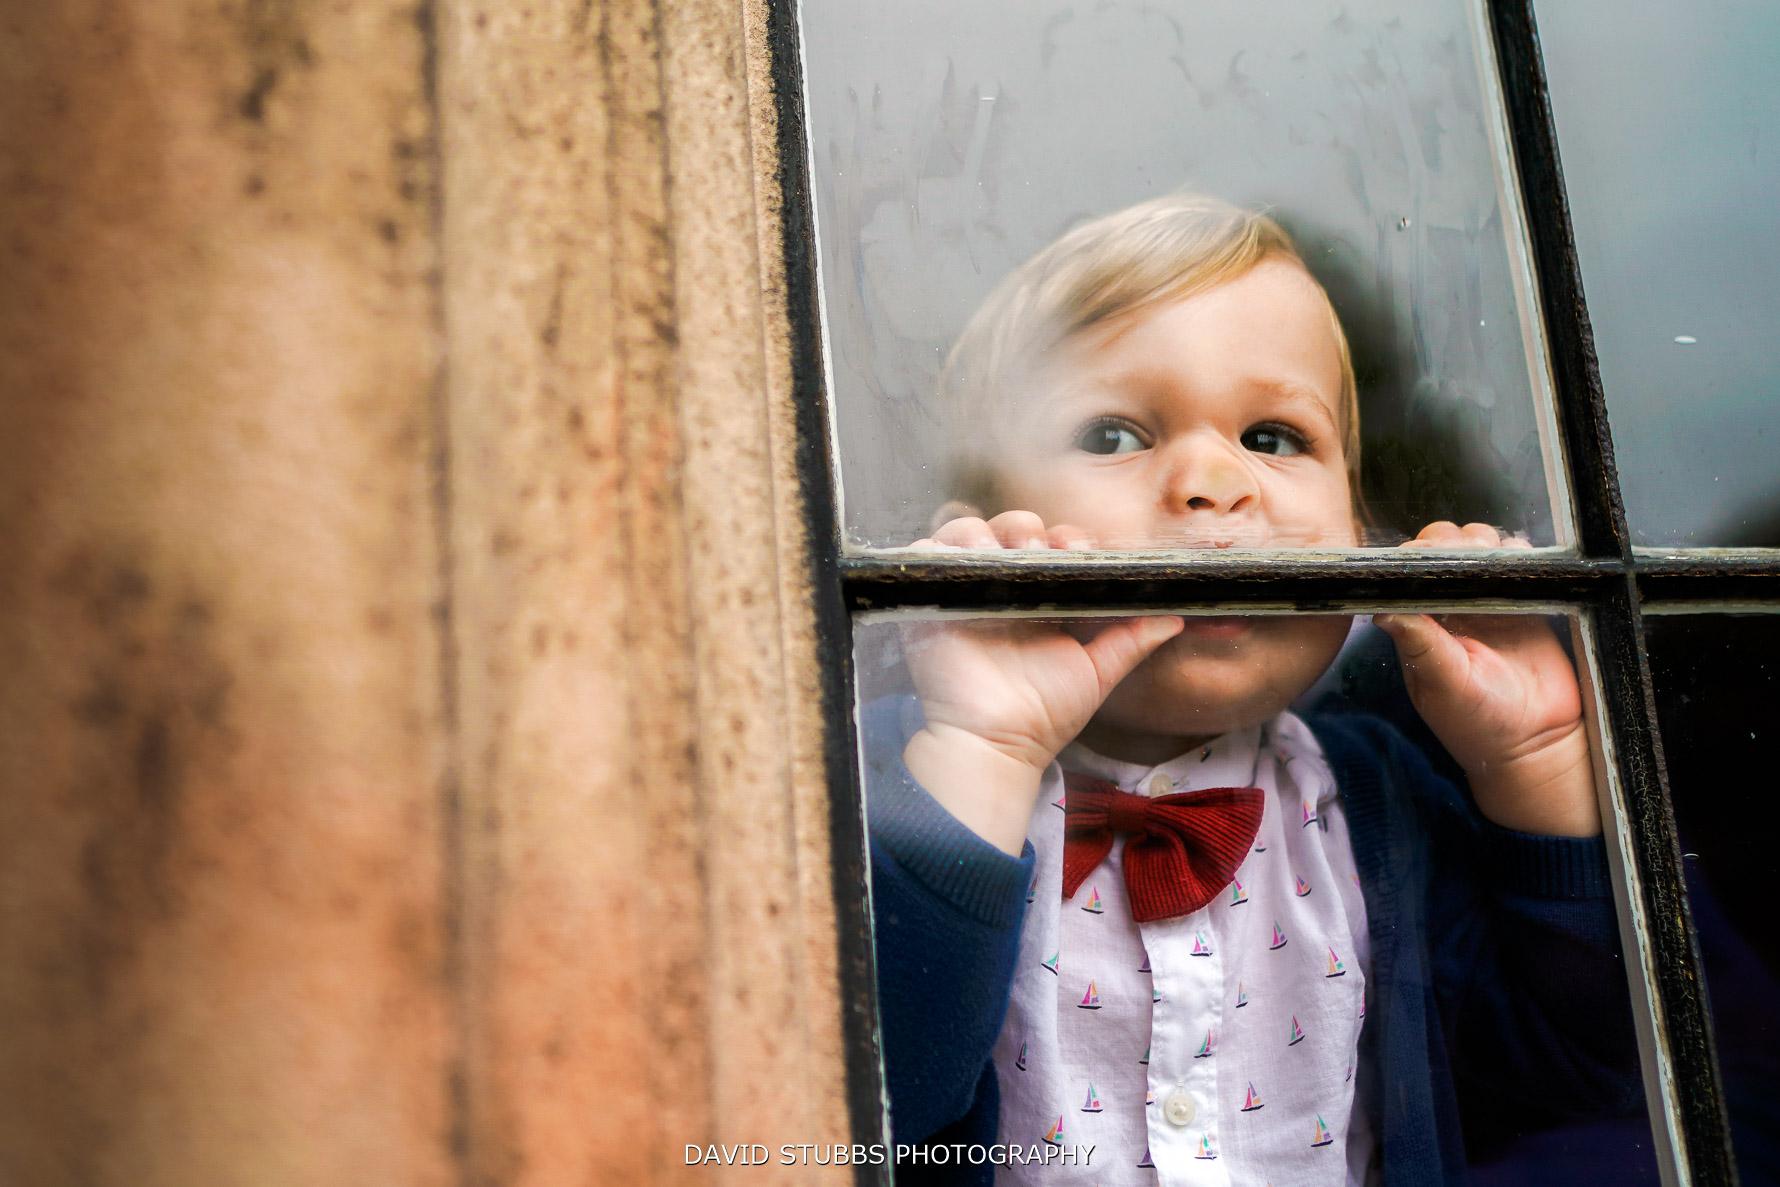 kid squashing face into window